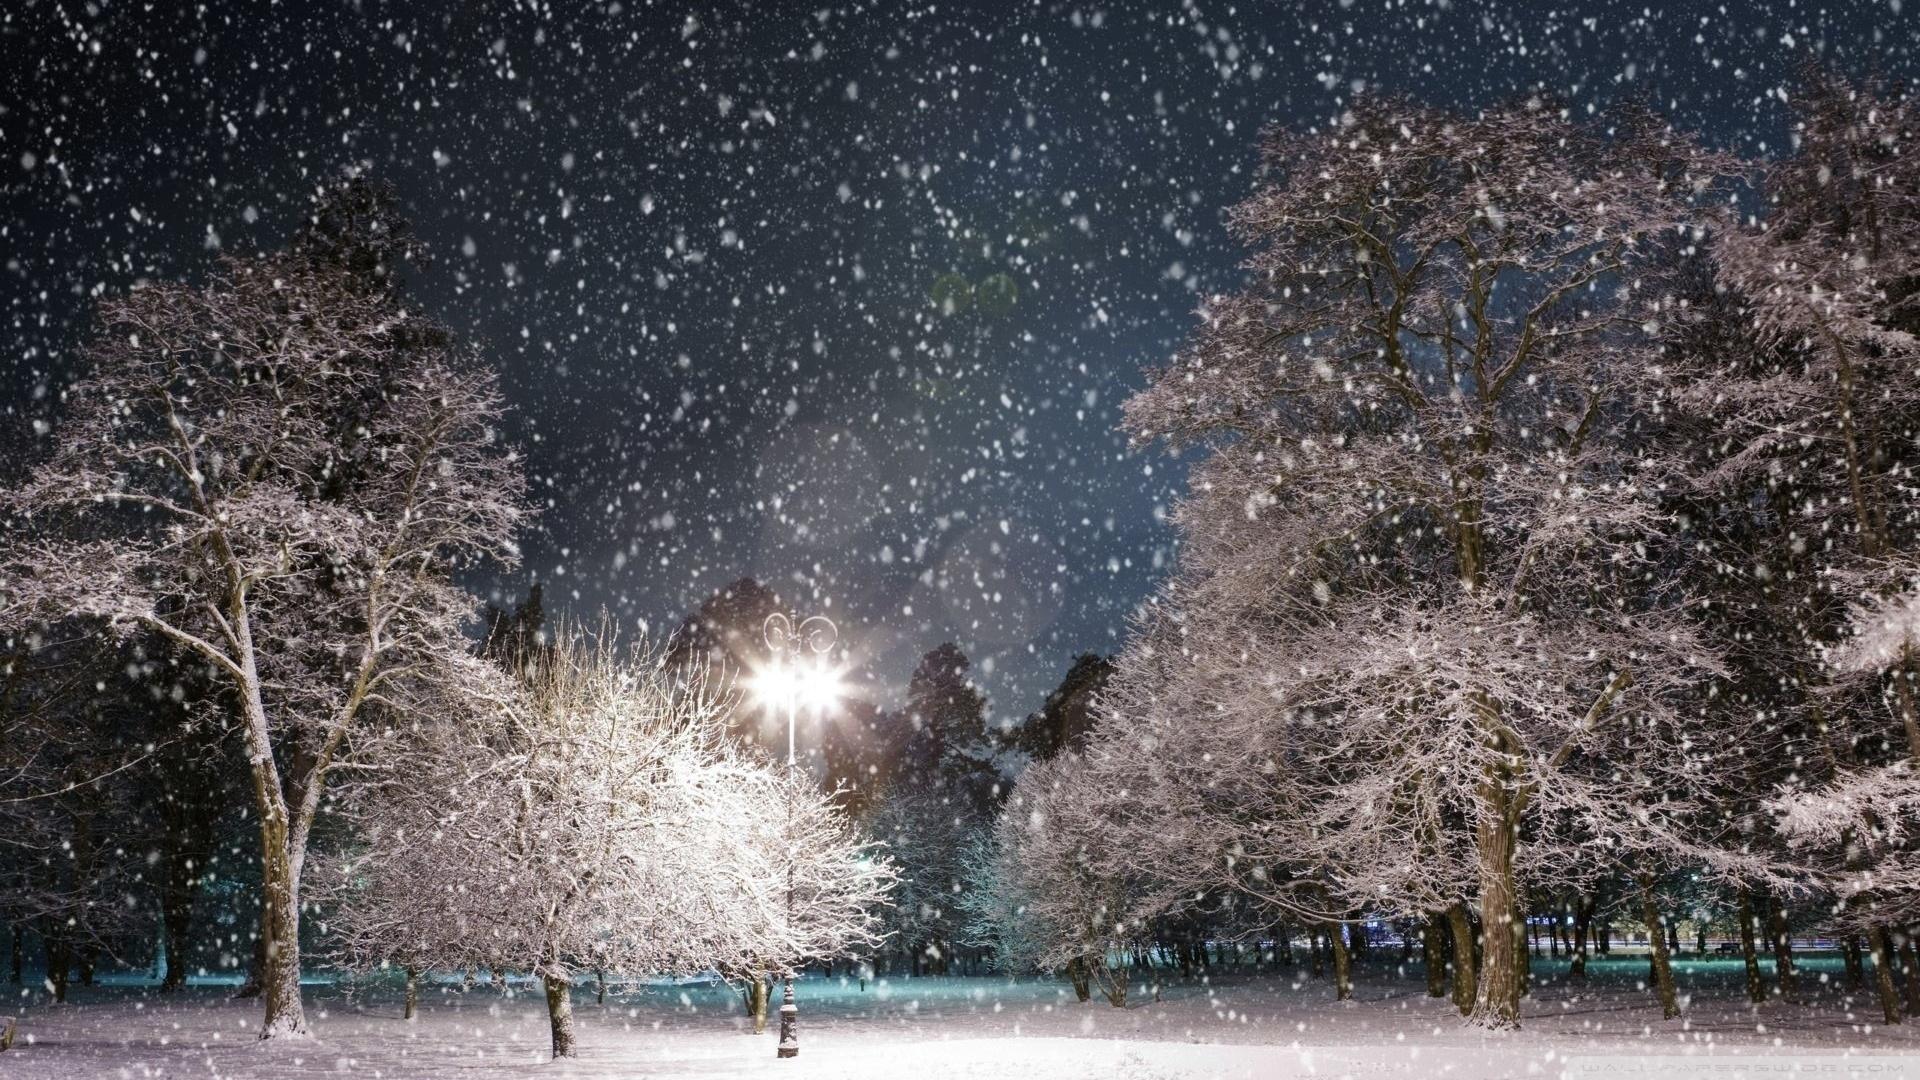 snow at night ❤ 4k hd desktop wallpaper for 4k ultra hd tv • wide